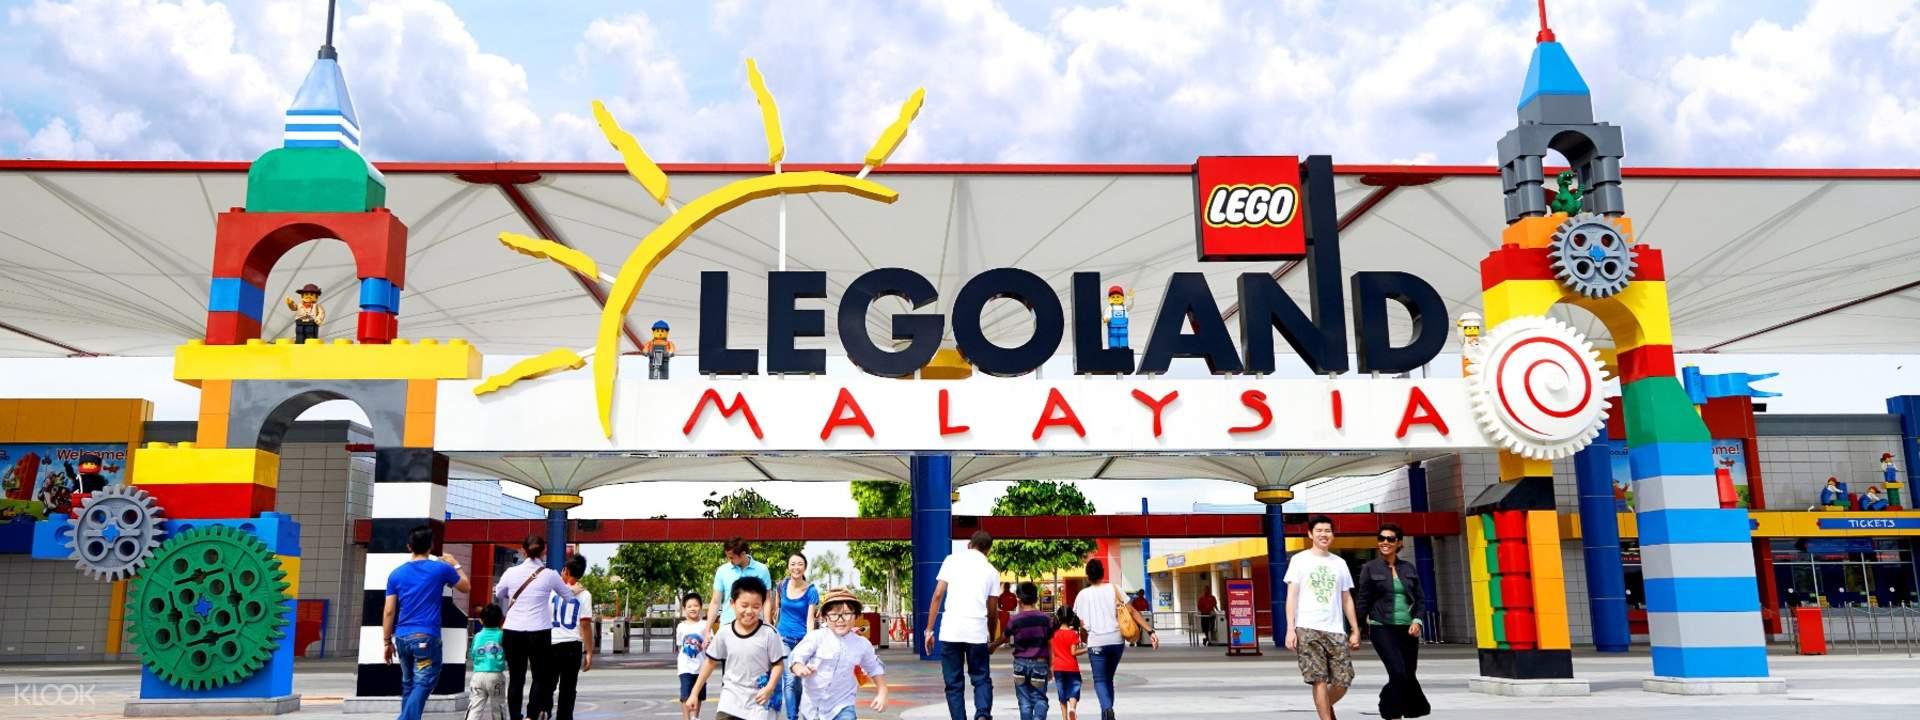 LEGOLAND® Malaysia VIP Expedition in Johor Bahru - Klook ...